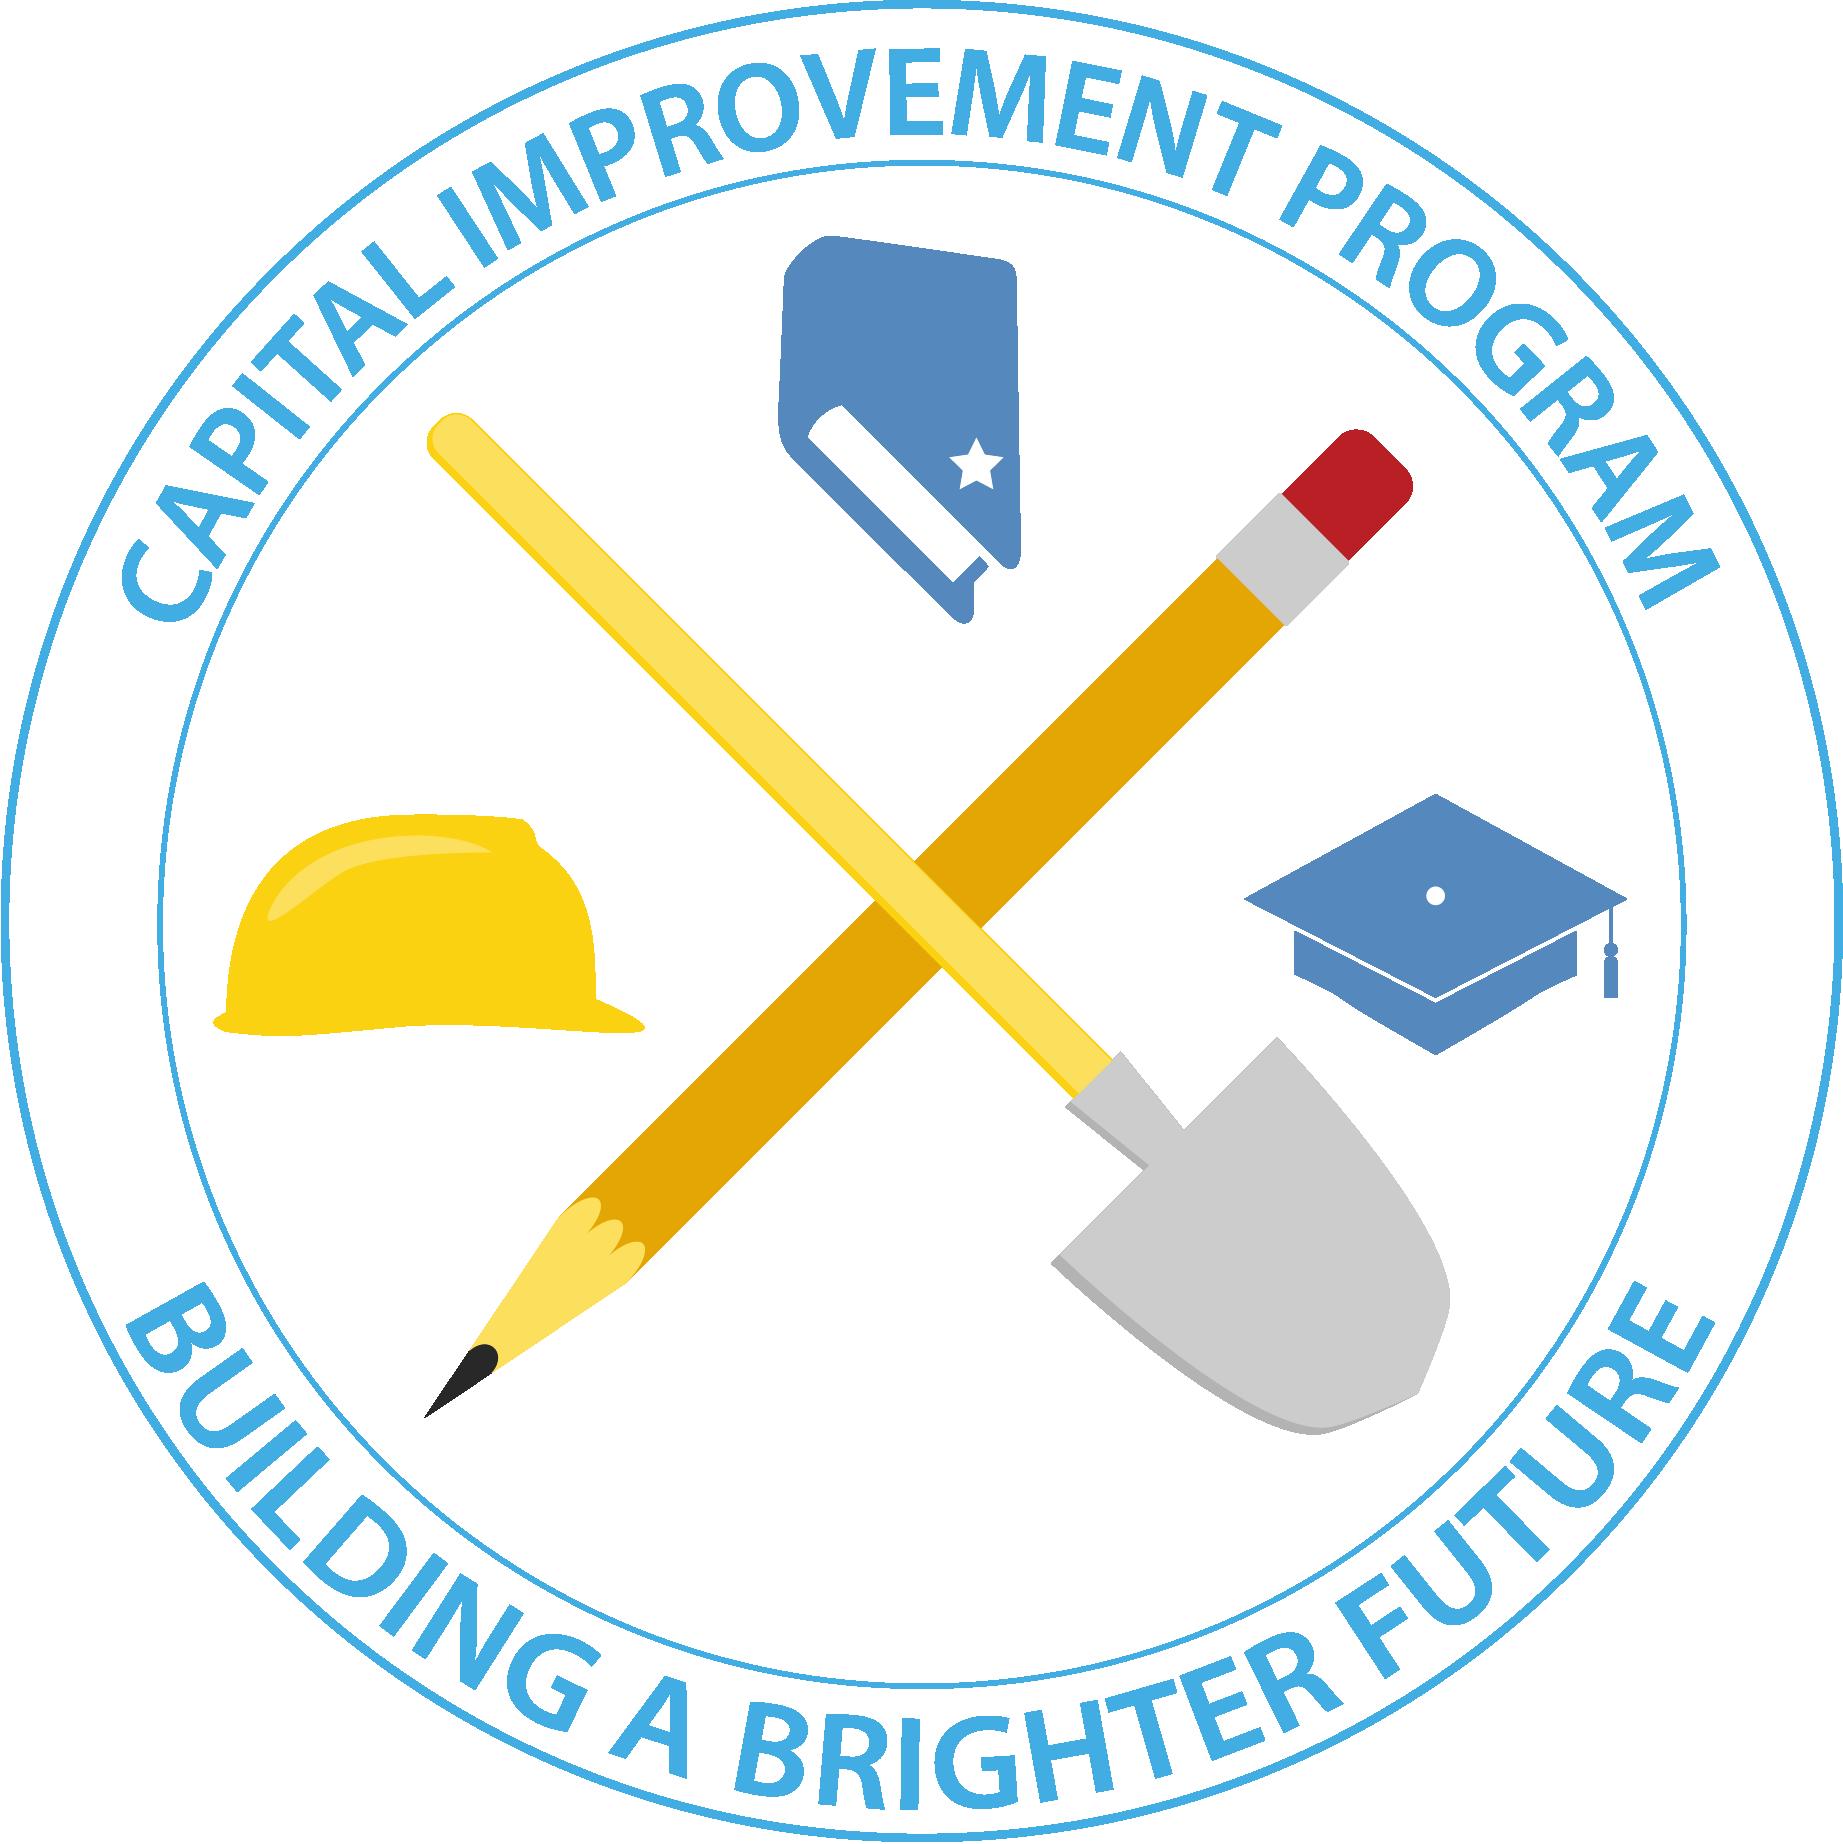 School improvement clipart clip art royalty free library Capital Improvement Program | Replacement Schools clip art royalty free library